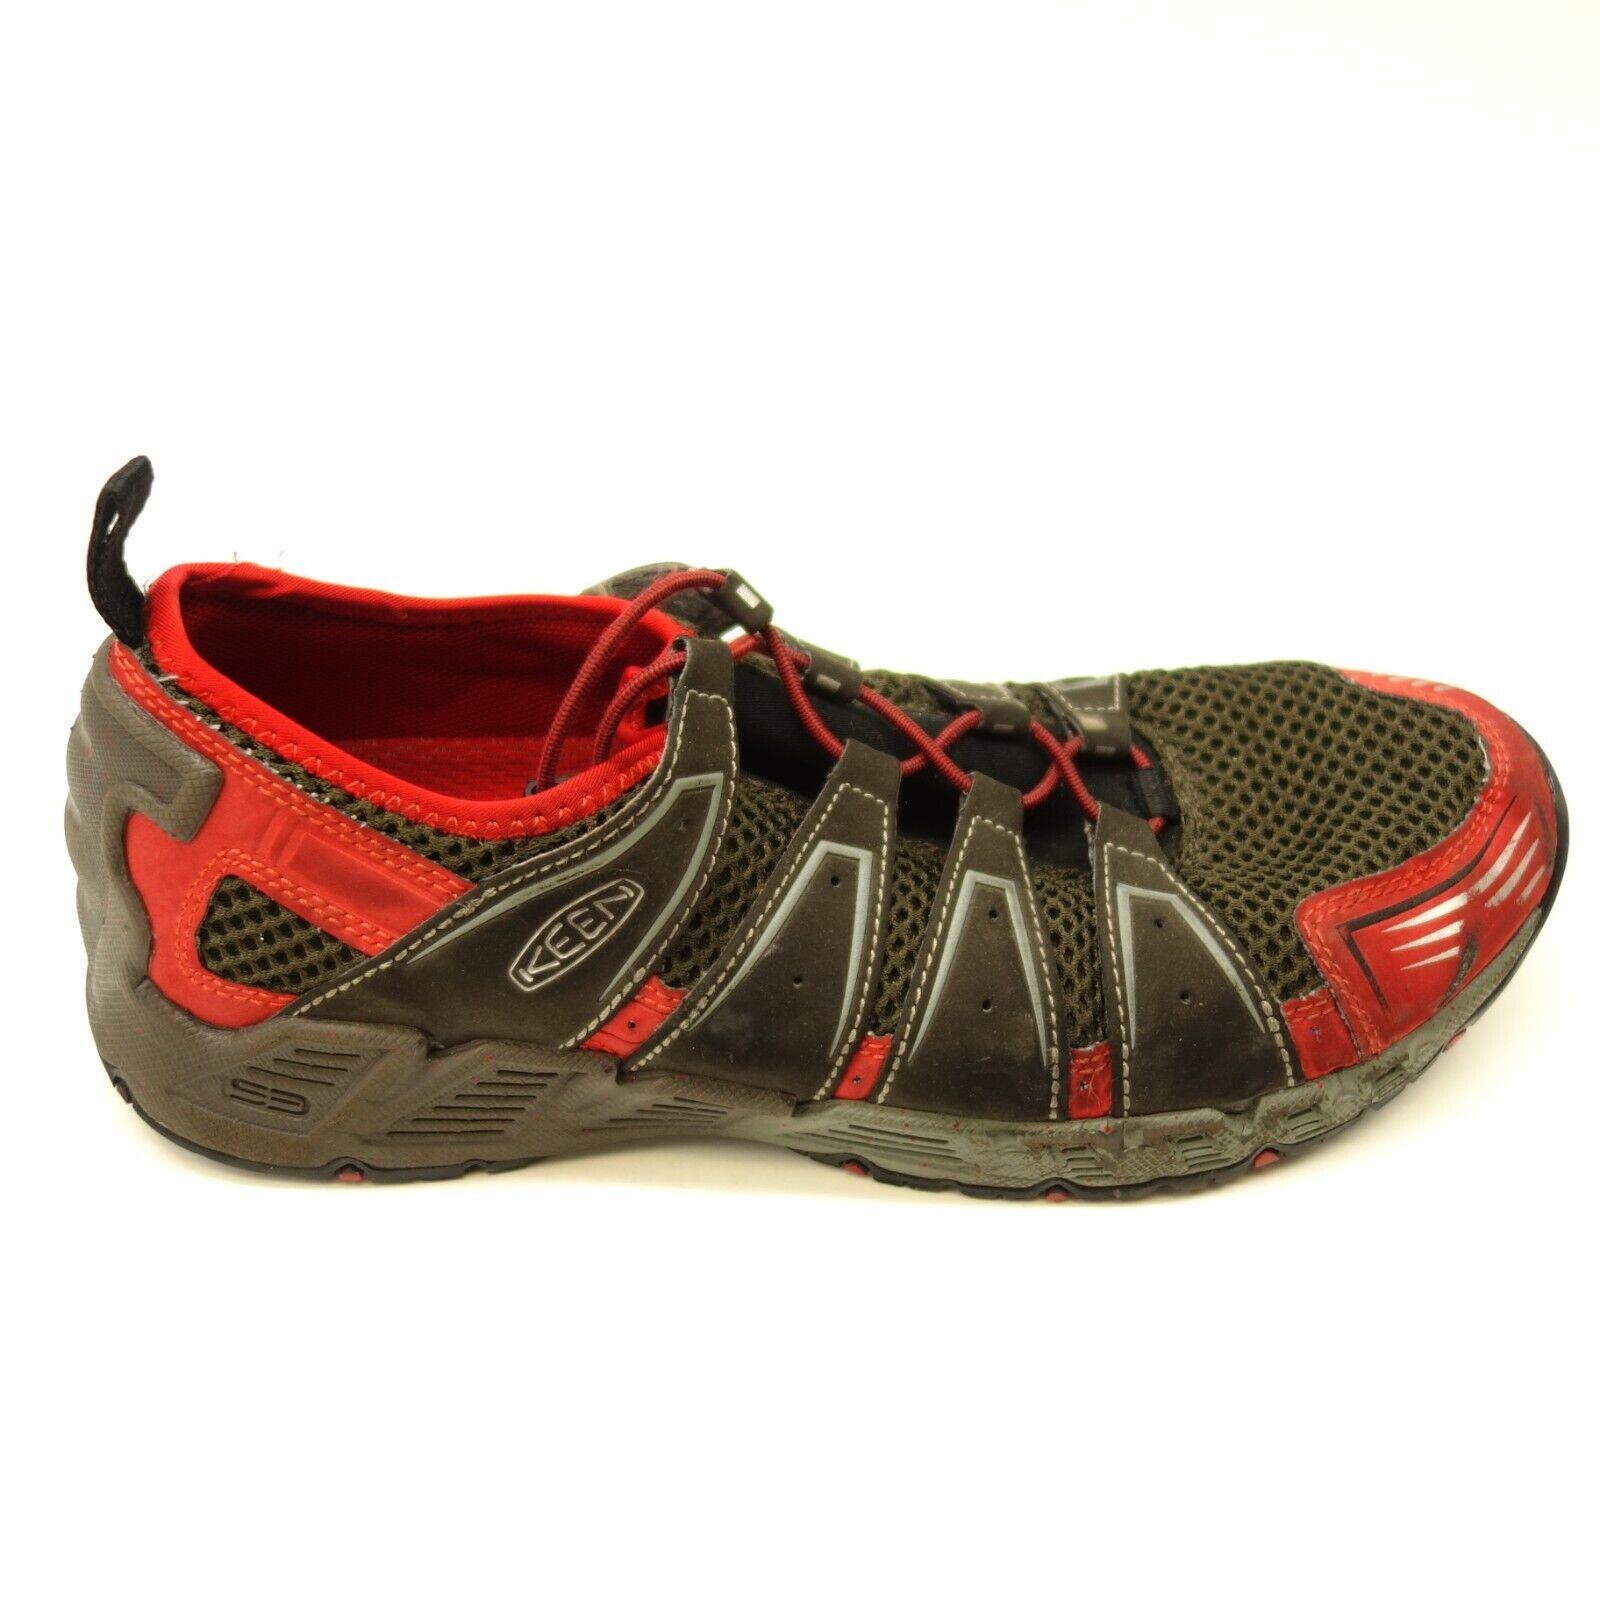 Keen Rojo Negro US 10 Senderismo Peso Ligero Transpirable Zapatos Hombre